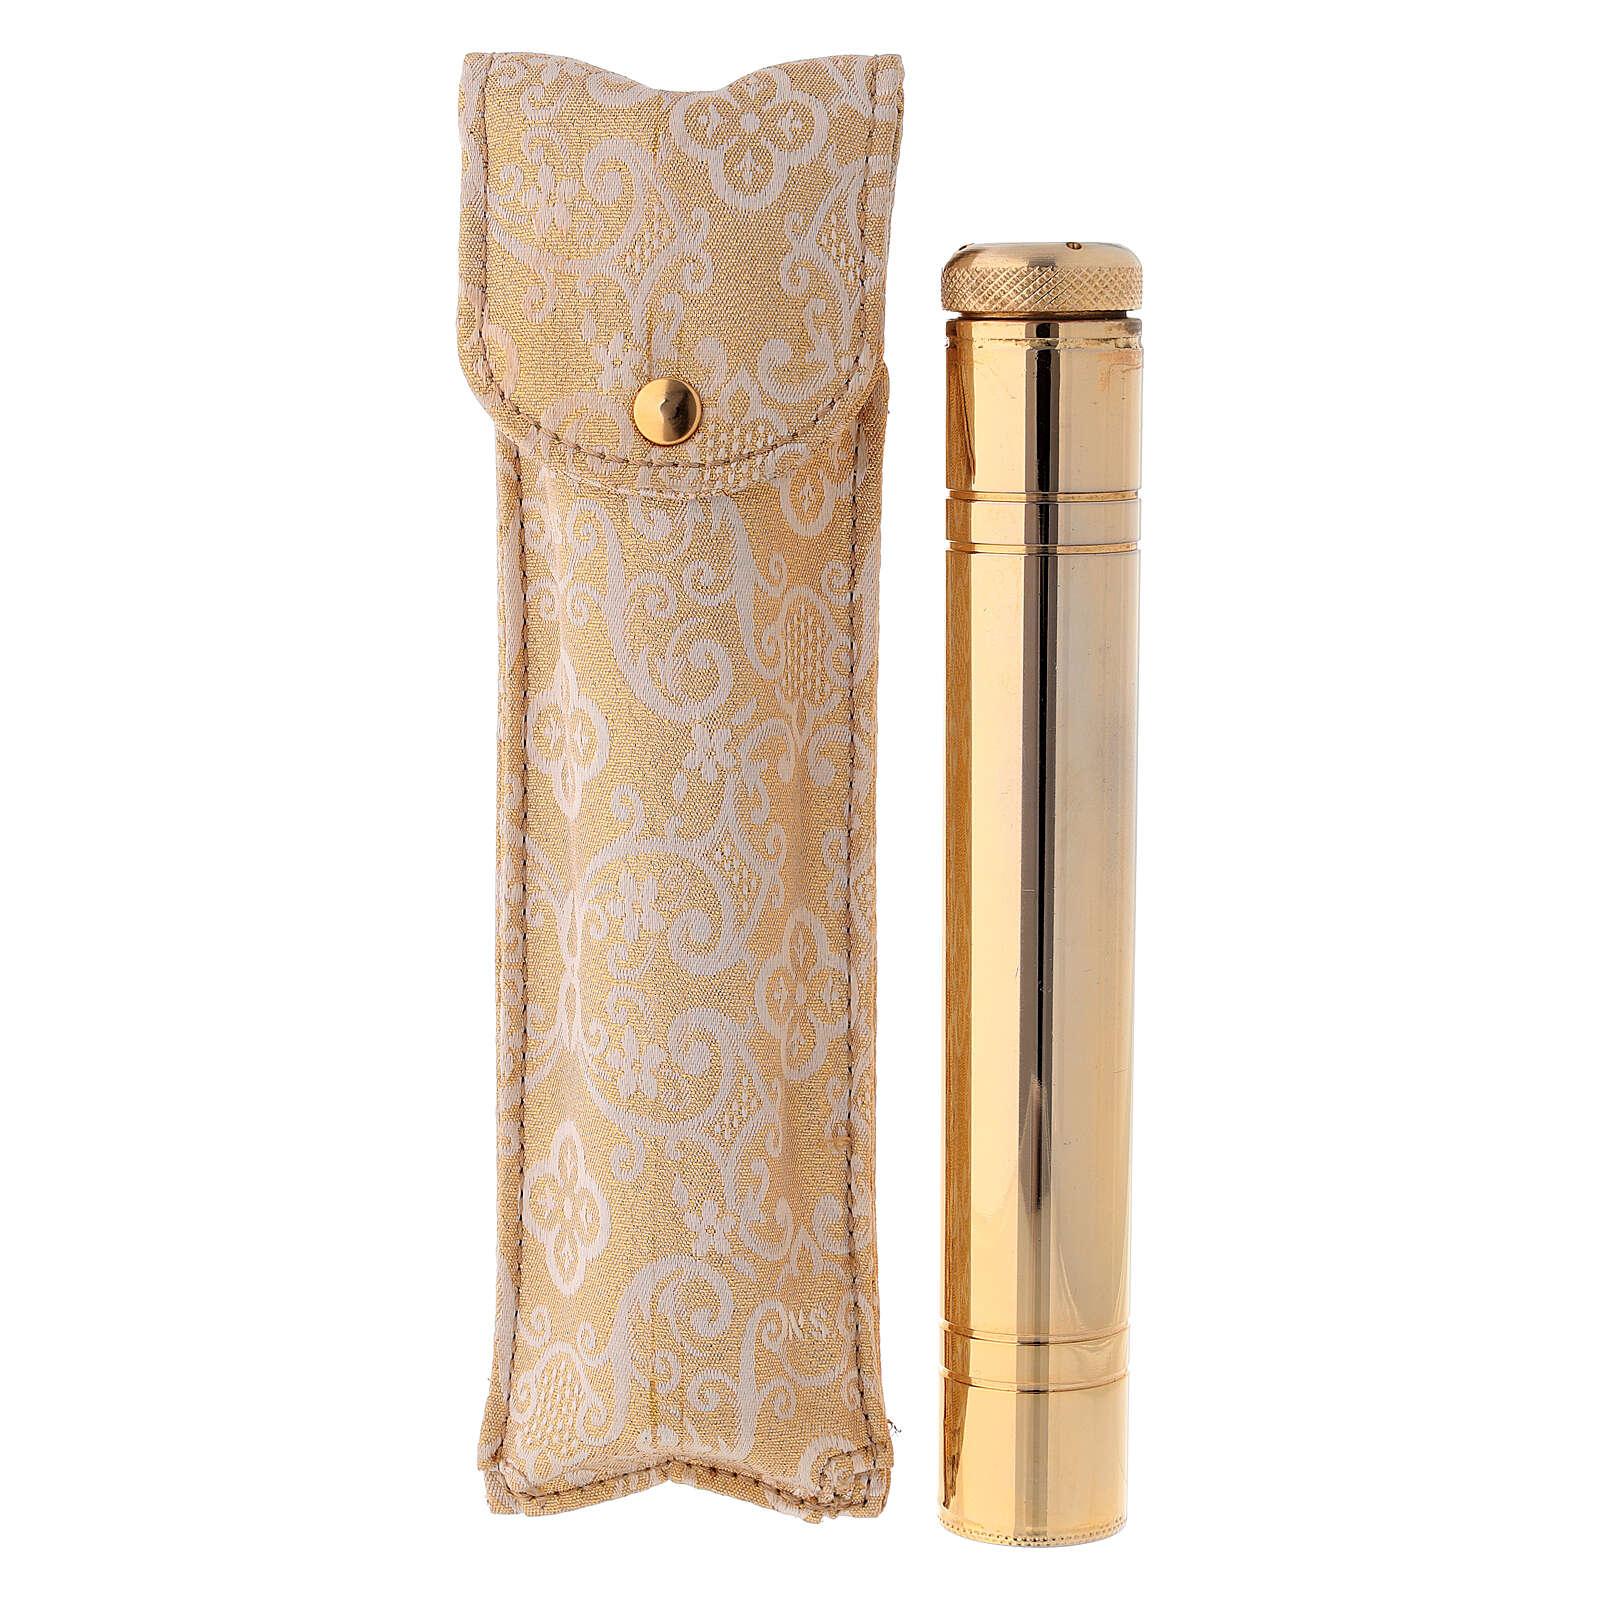 Aspersorio 16 cm dorado estuche jacquard oro claro 3